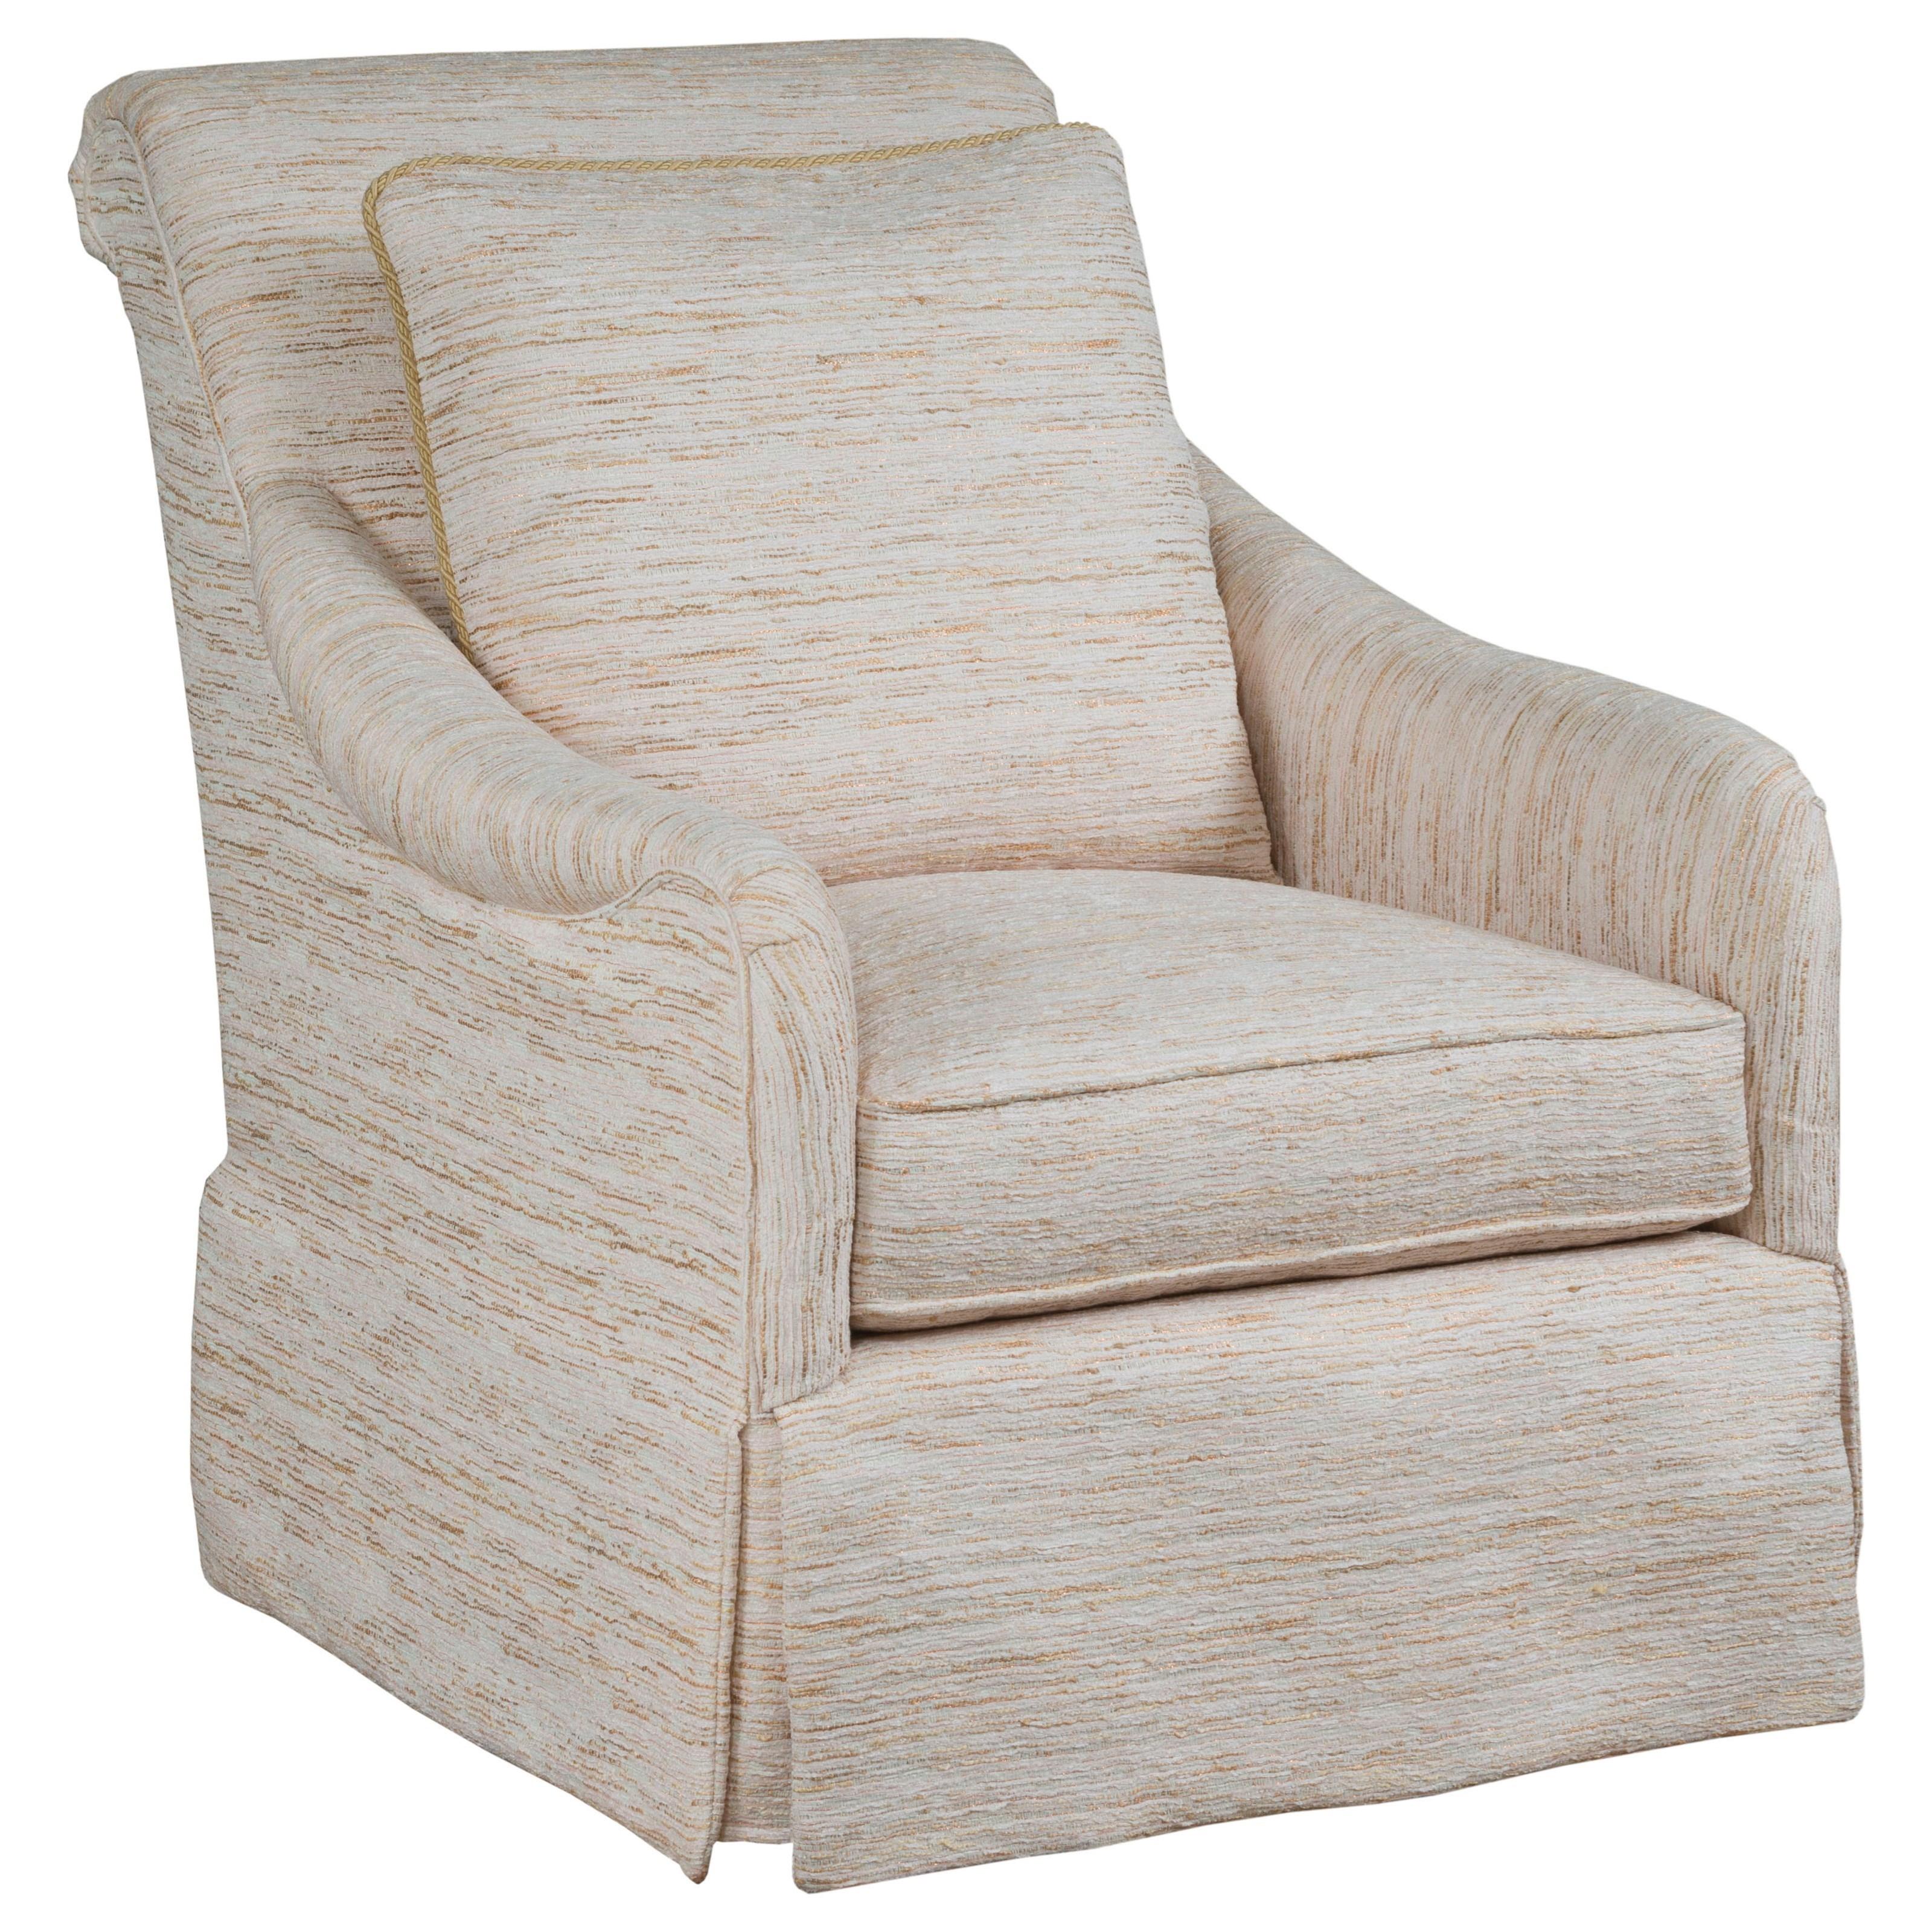 Joceylyn Upholstered Swivel Glider by Kincaid Furniture at Johnny Janosik